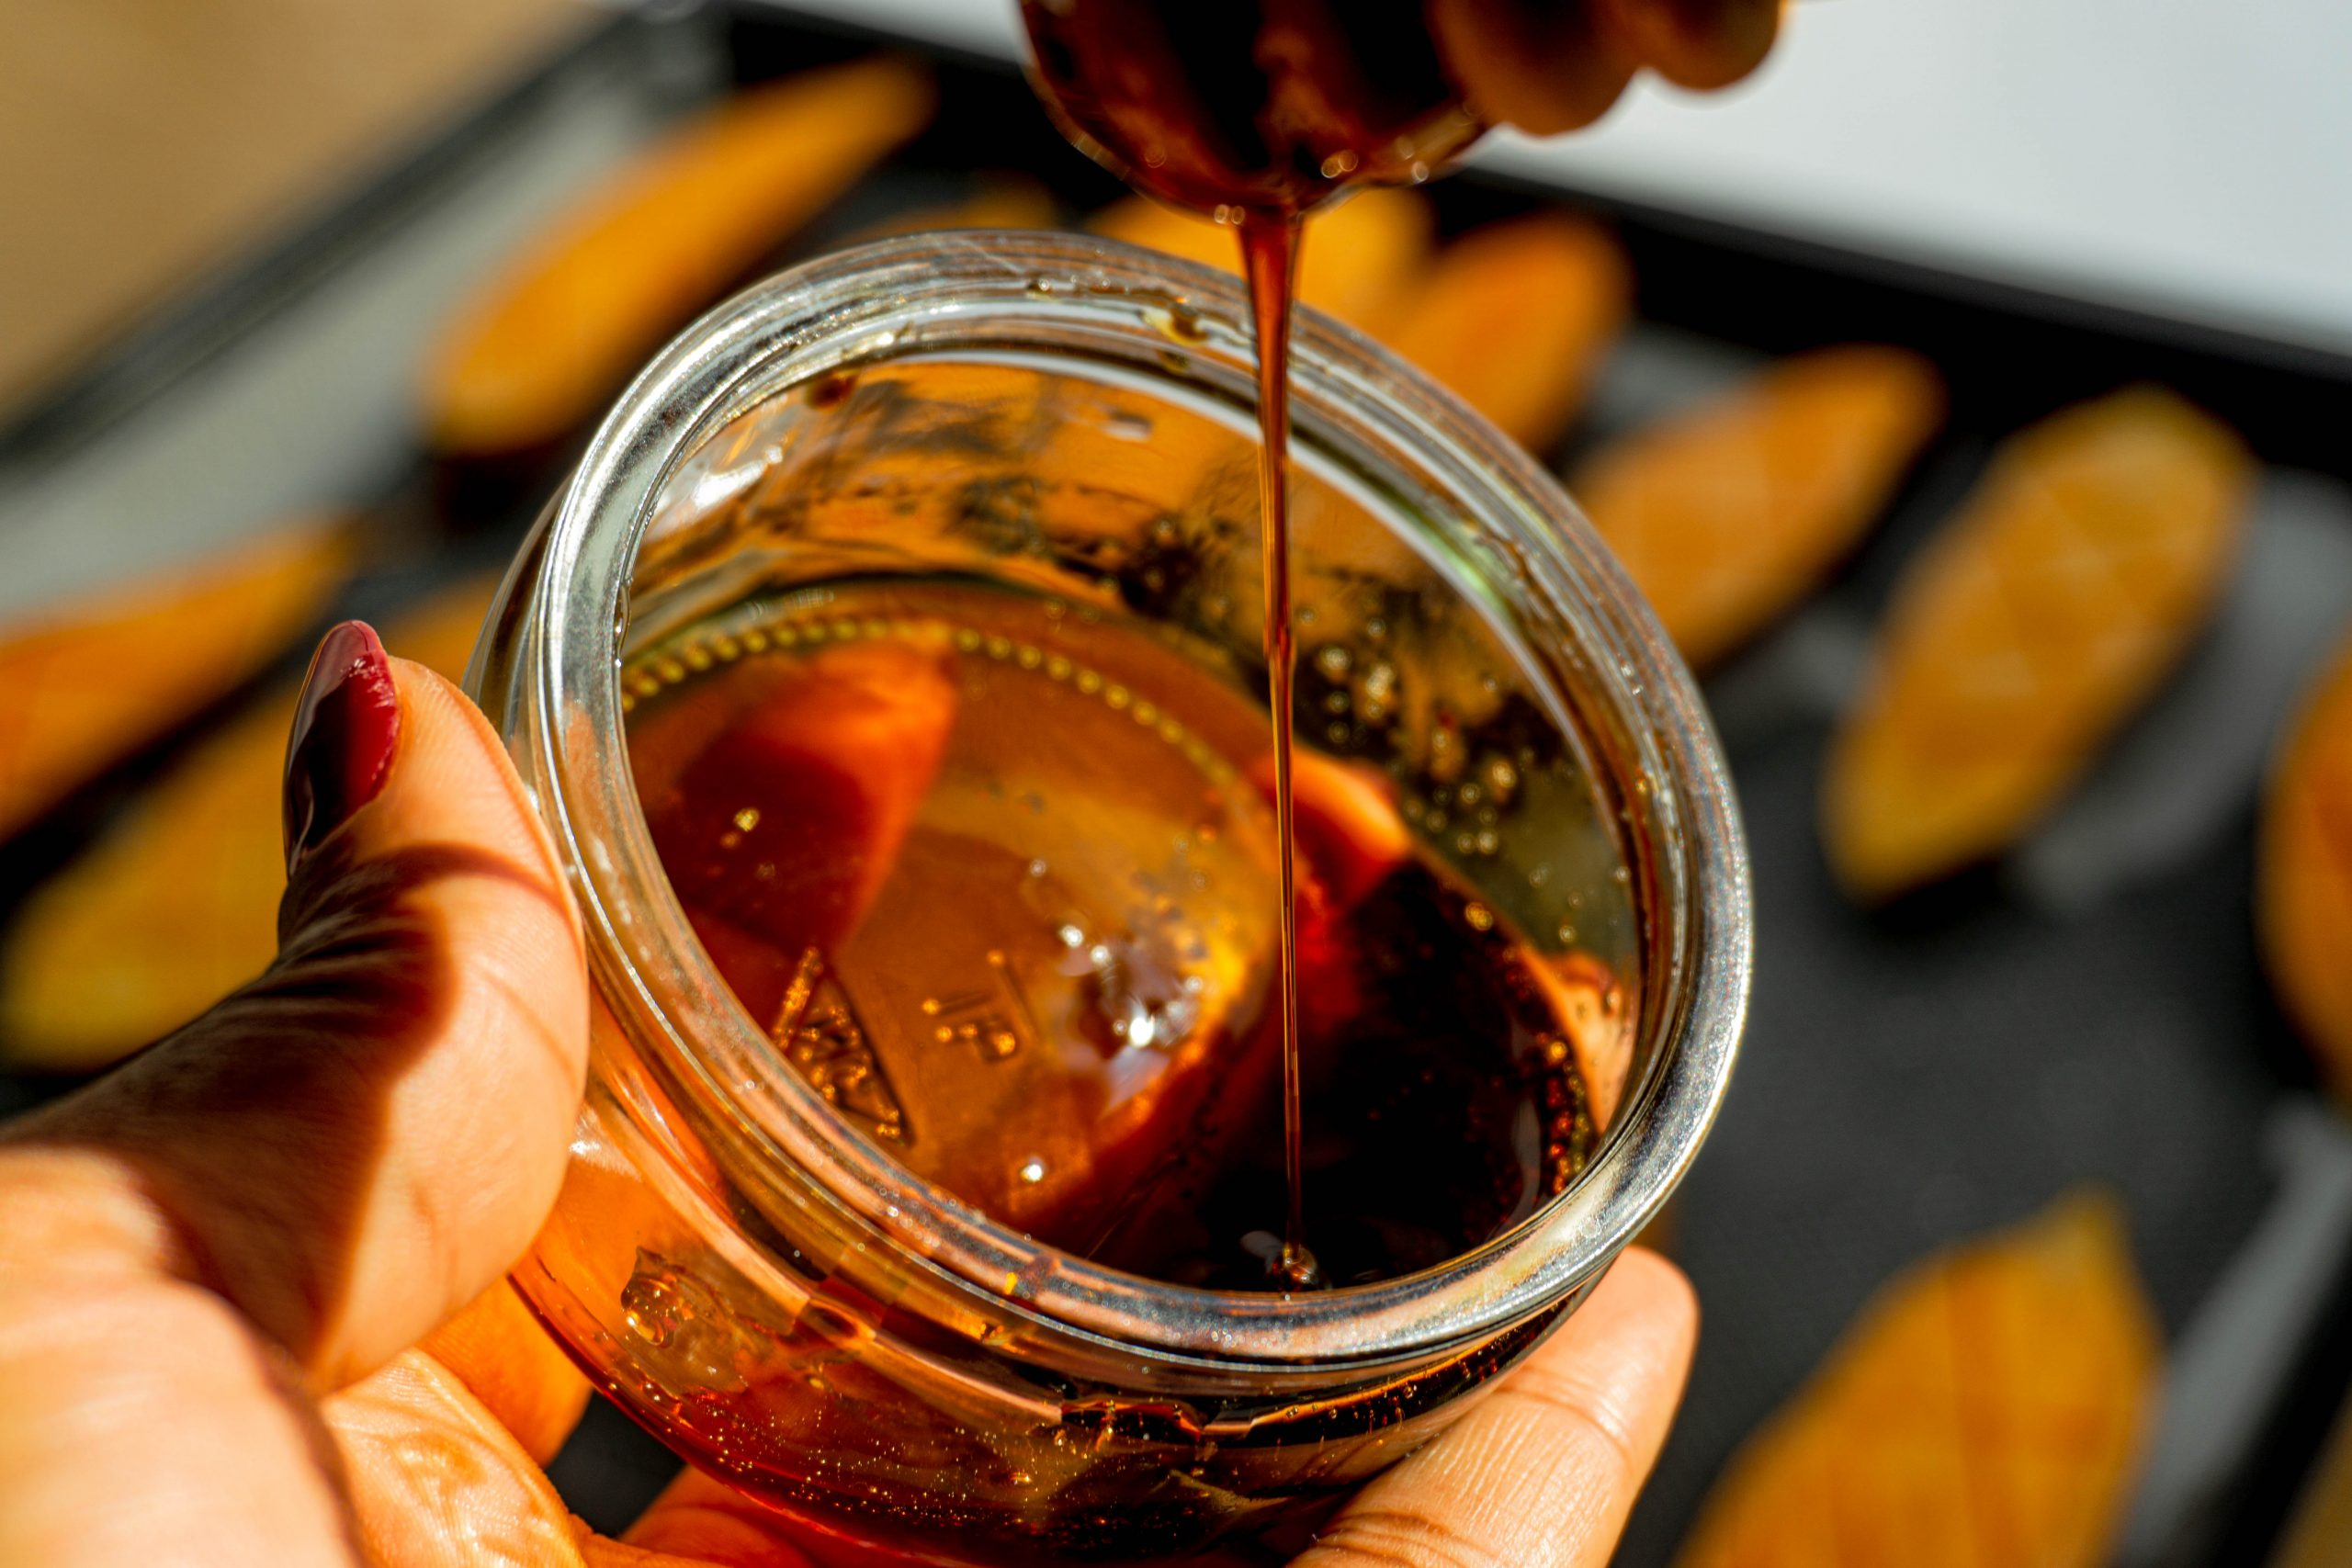 Honey the aphrodisiac ingredient for valentine's day